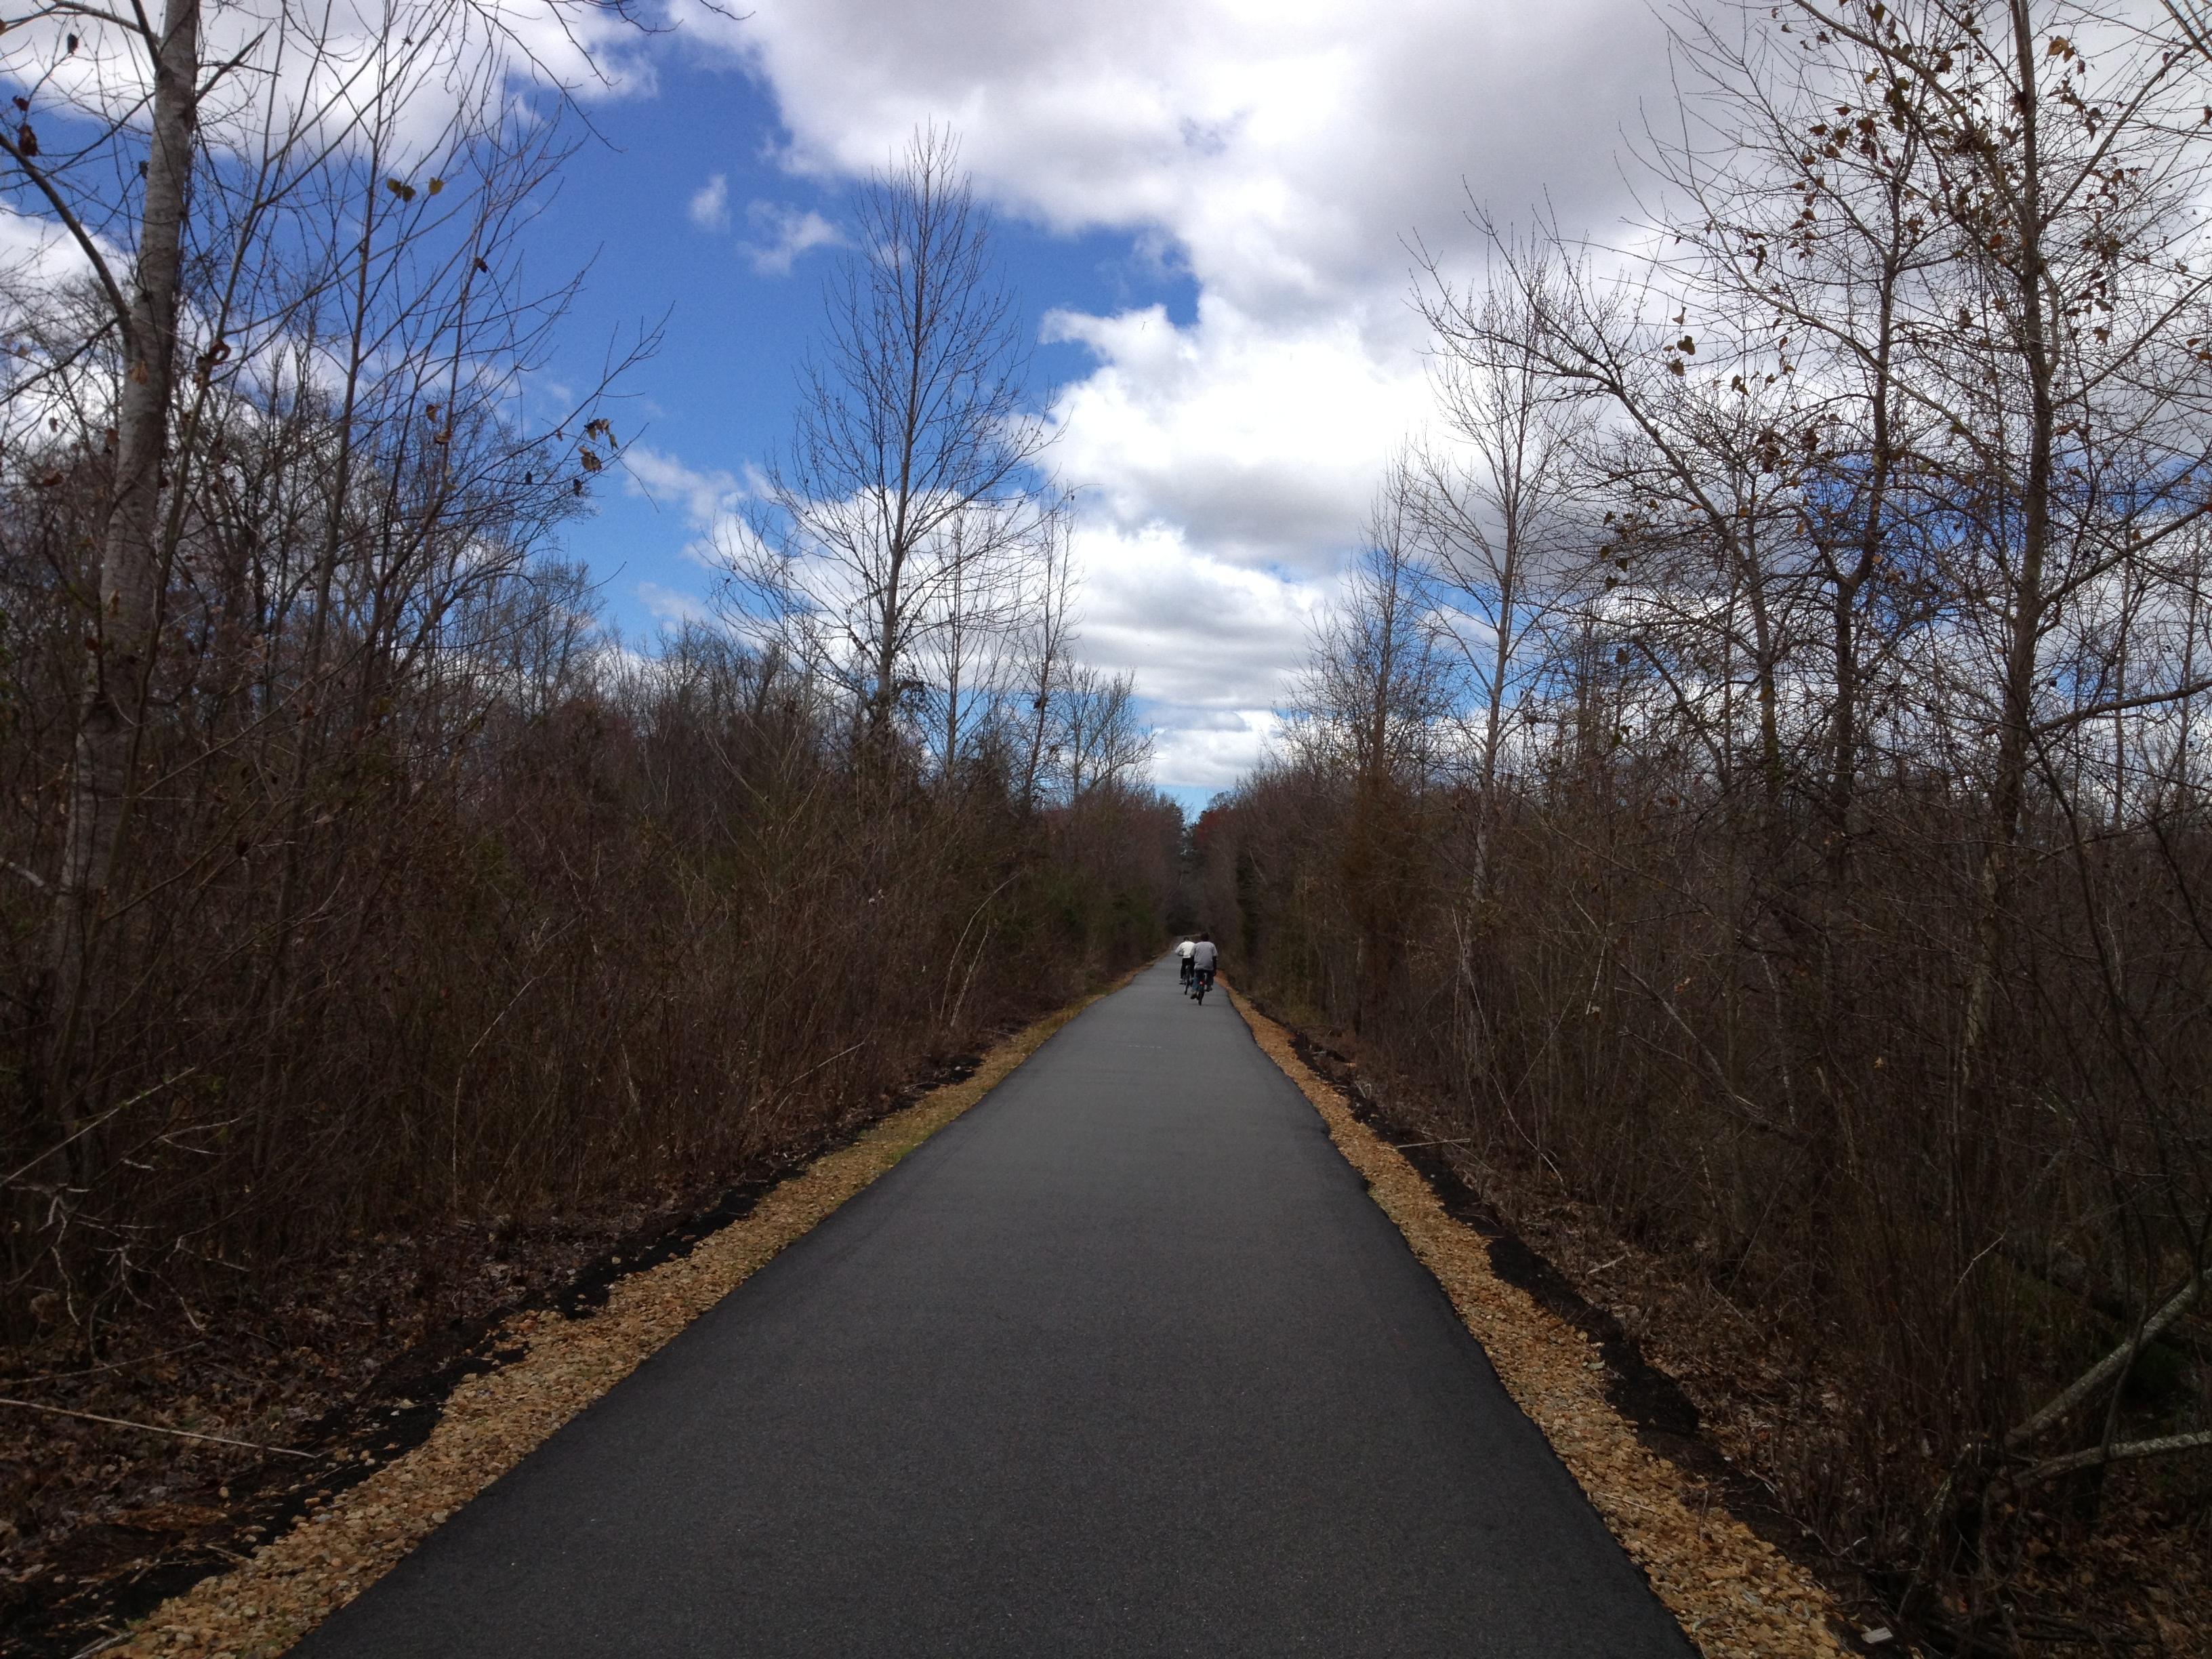 Swamp Rabbit Trail, Greenville, SC